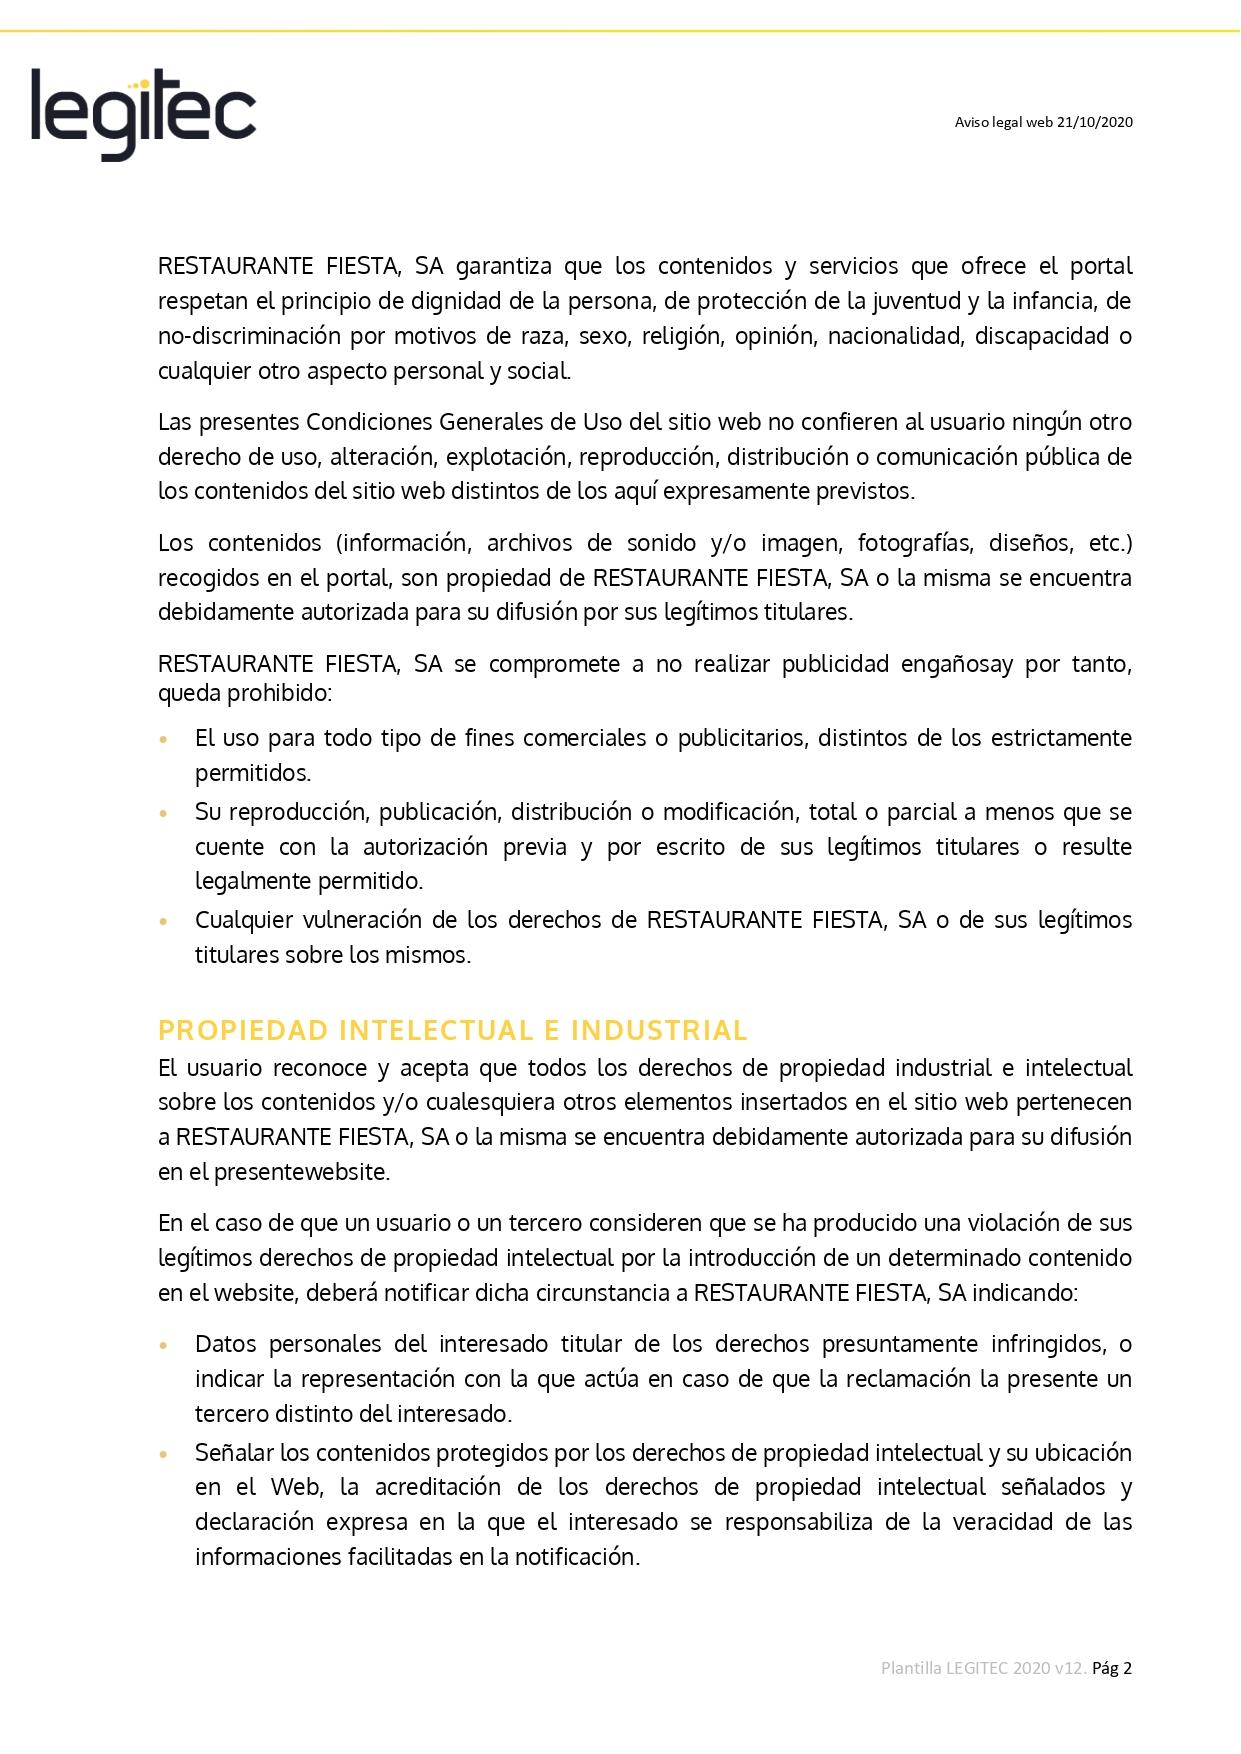 WEB-AVISO-LEGAL_page-0002